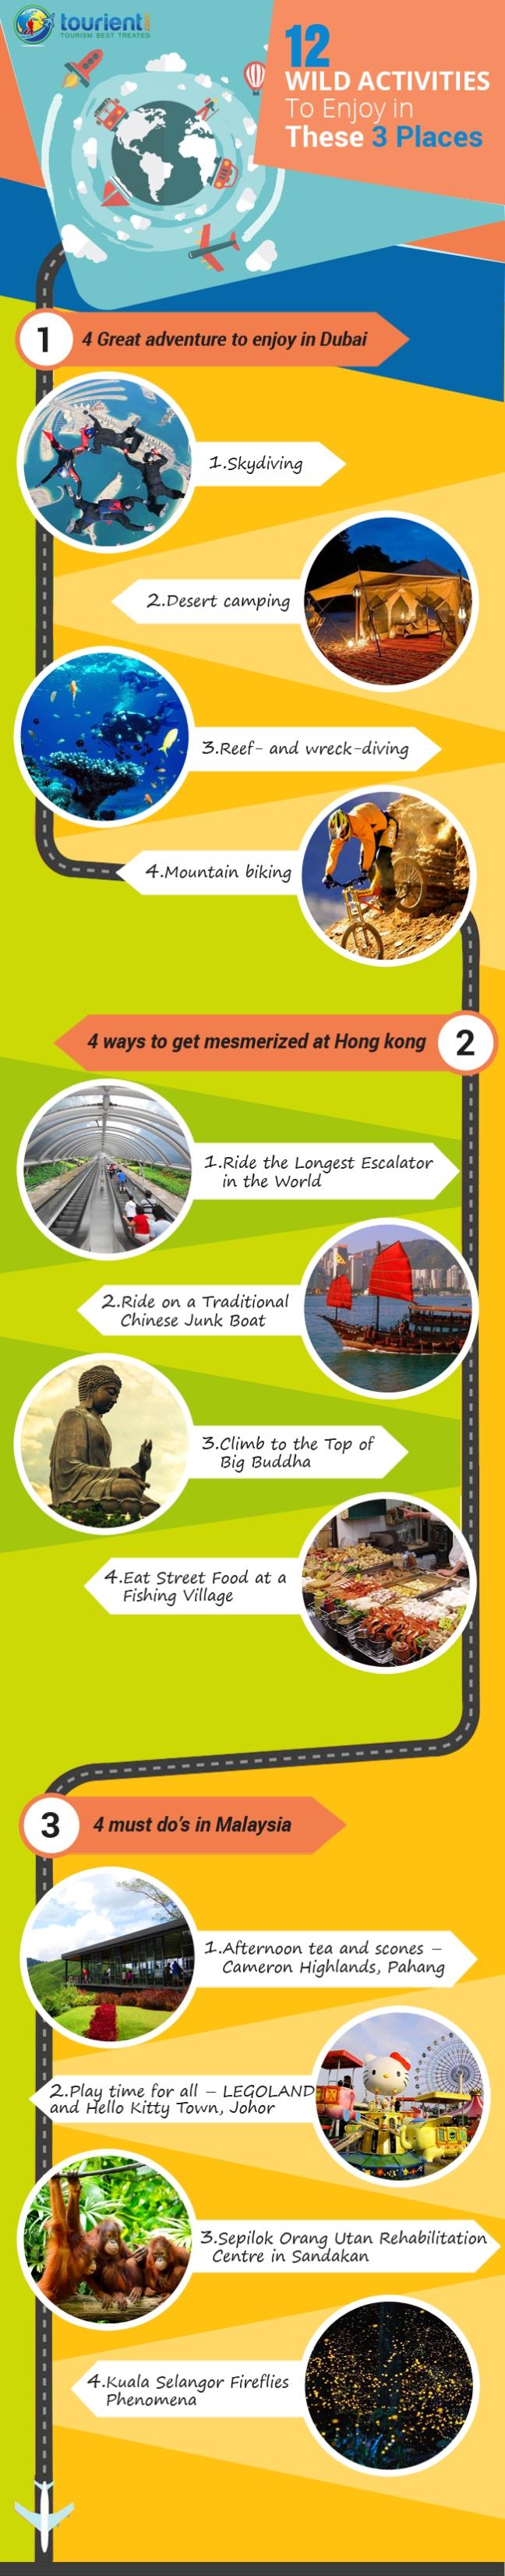 wild-activities-to-enjoy-in-dubaihong-kong-and-malysia